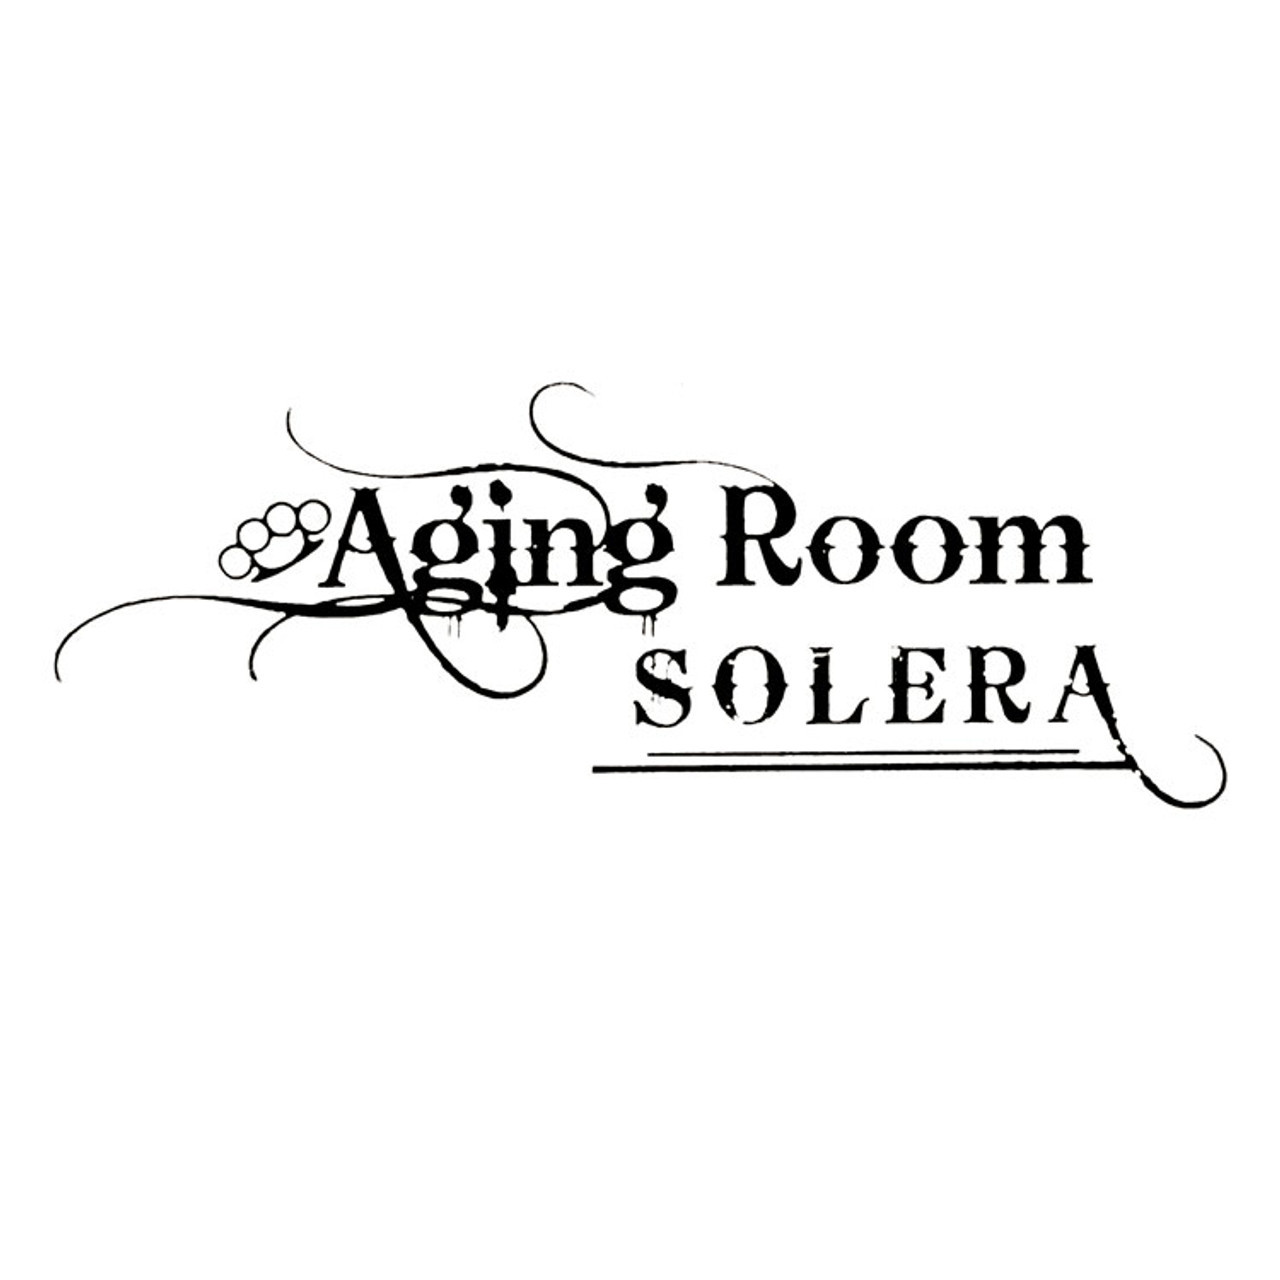 Aging Room Solera Fantastico Corojo Cigars - 5.75 x 54 (Box of 21)